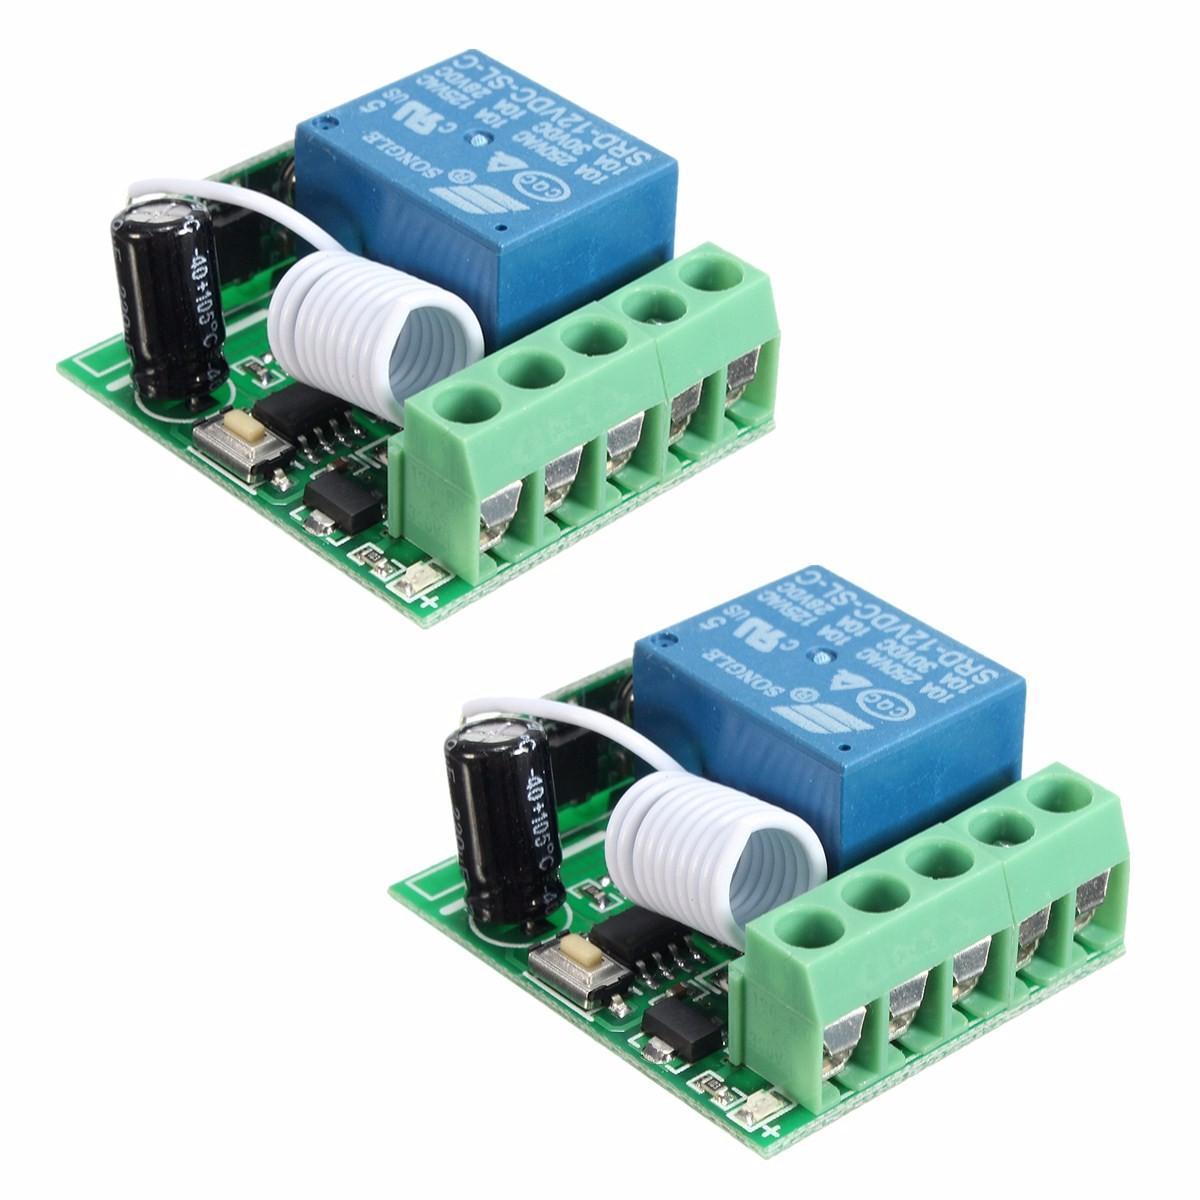 2Pcs DC12V 10A 1CH 433MHz Wireless Relay RF Remote Control Switch Receiver